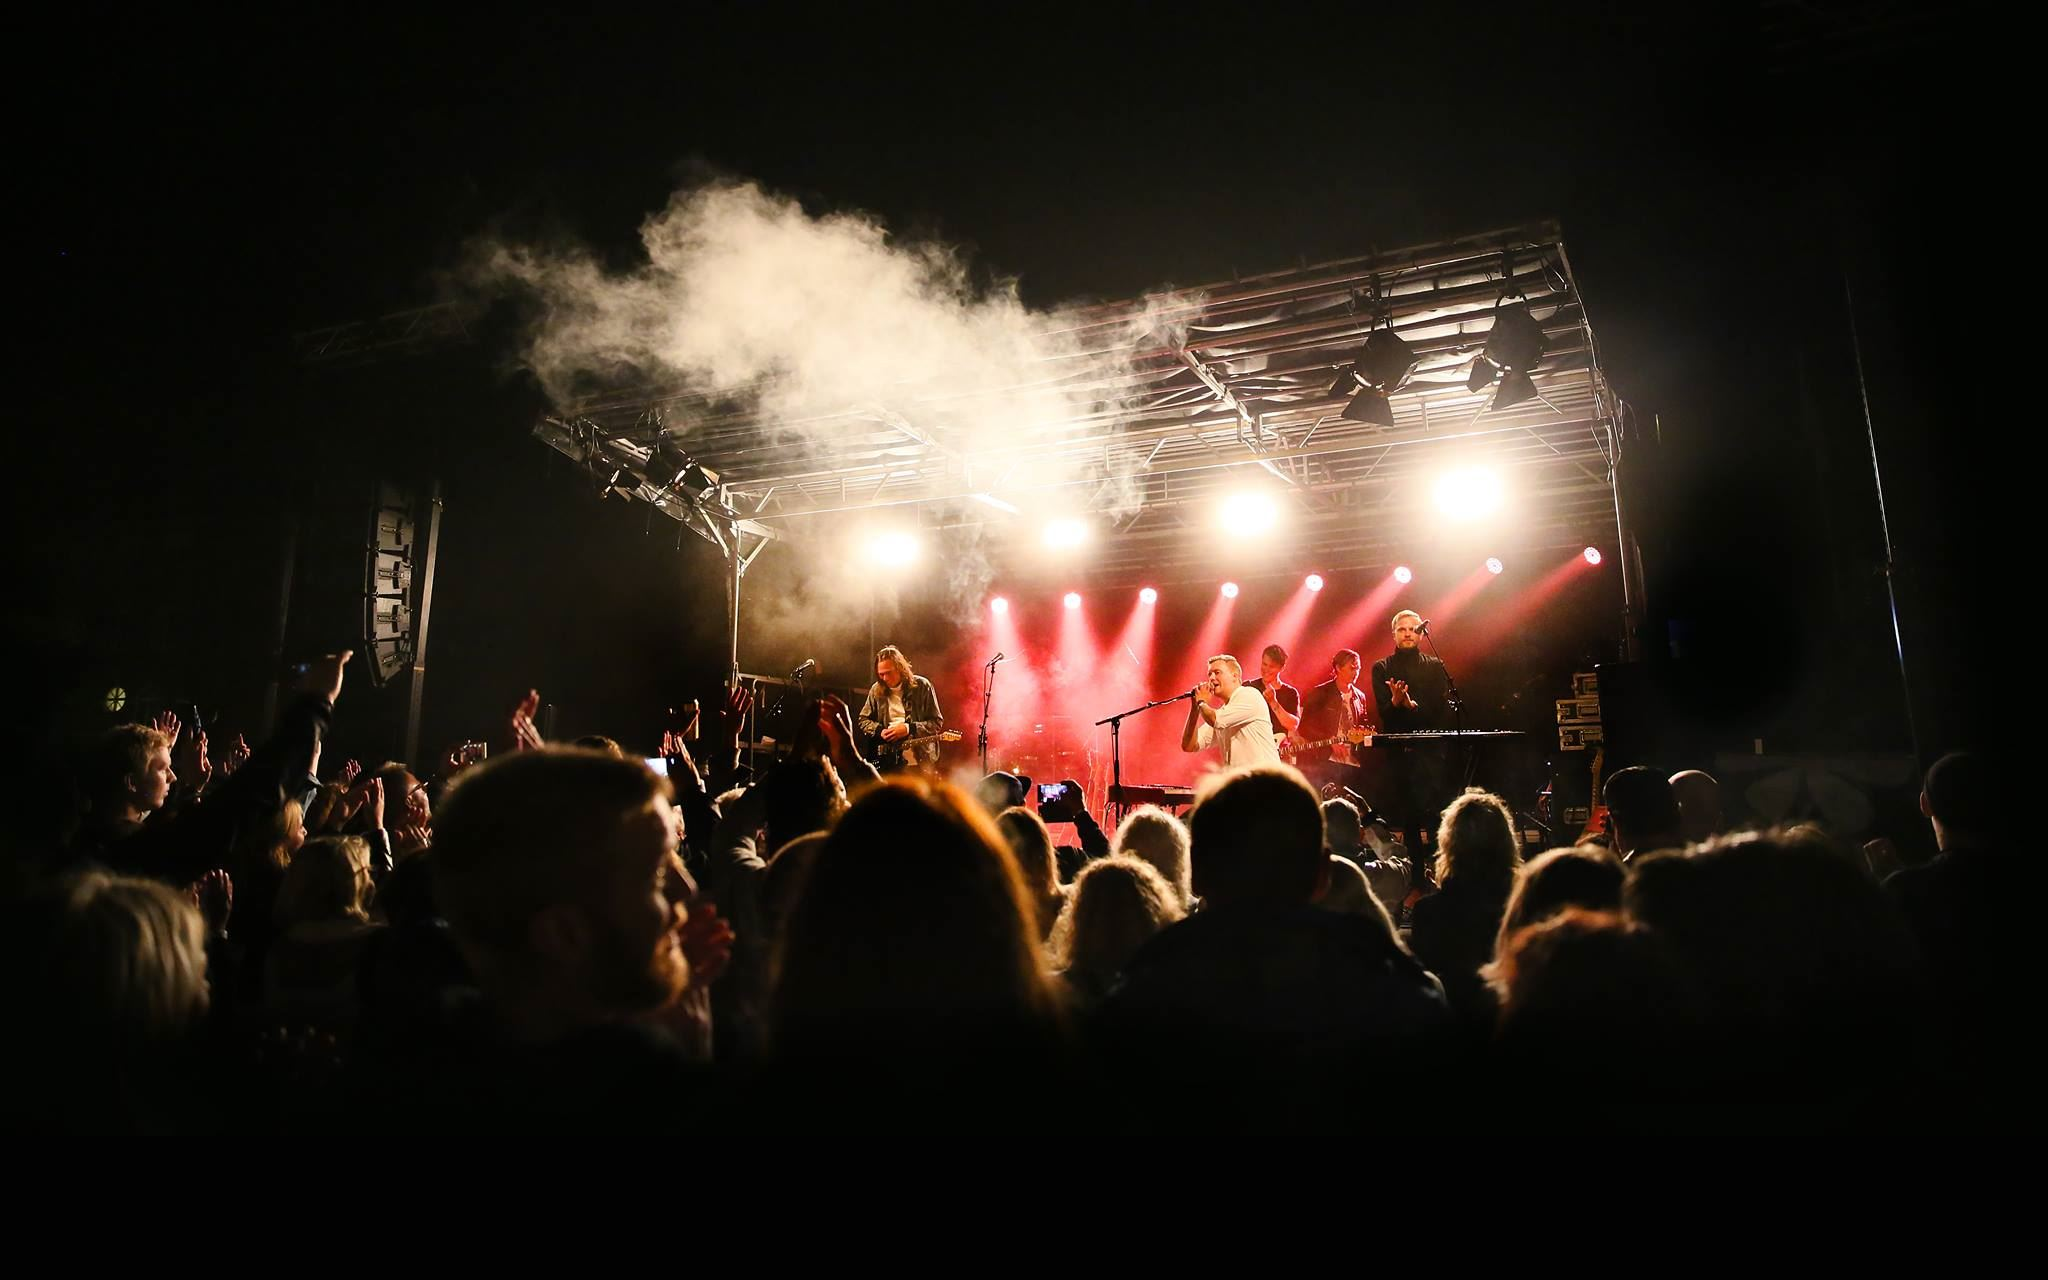 Live music at Paraply Pop Up - Fisktorget